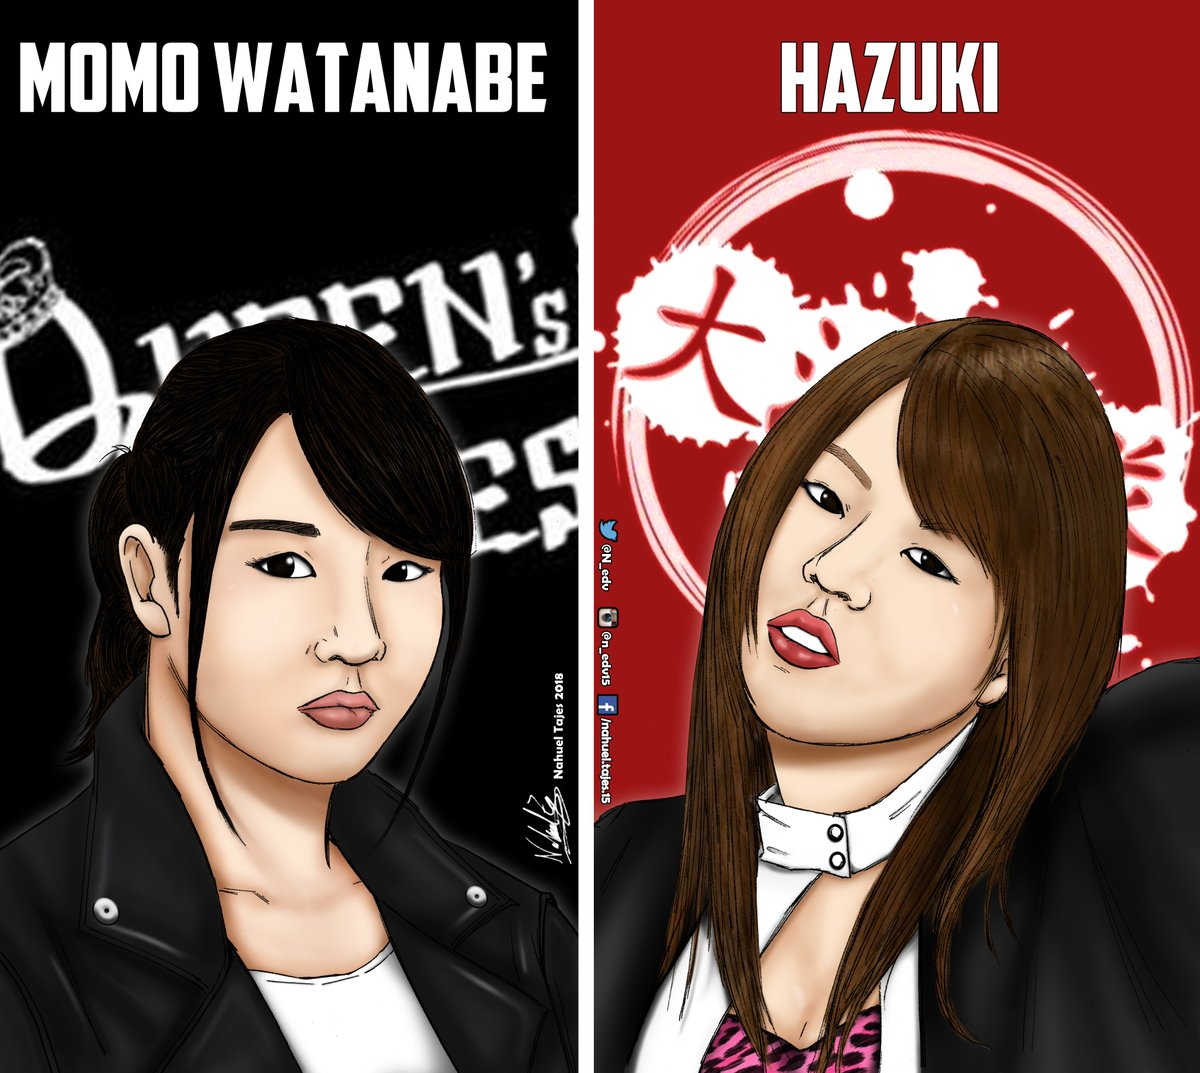 Wonder of Stardom Title July 16, Korakuen Hall  @stardom_momo vs @0929_hazuki   #Stardom #WeAreStardom #fanart #joshi #drawing #dibujo #スターダム #QueensQuest #OedoTai #Hazuki #MomoWatanabe @we_are_stardom @wwr_stardom @totaldivaseps<br>http://pic.twitter.com/He61tLmK5Z